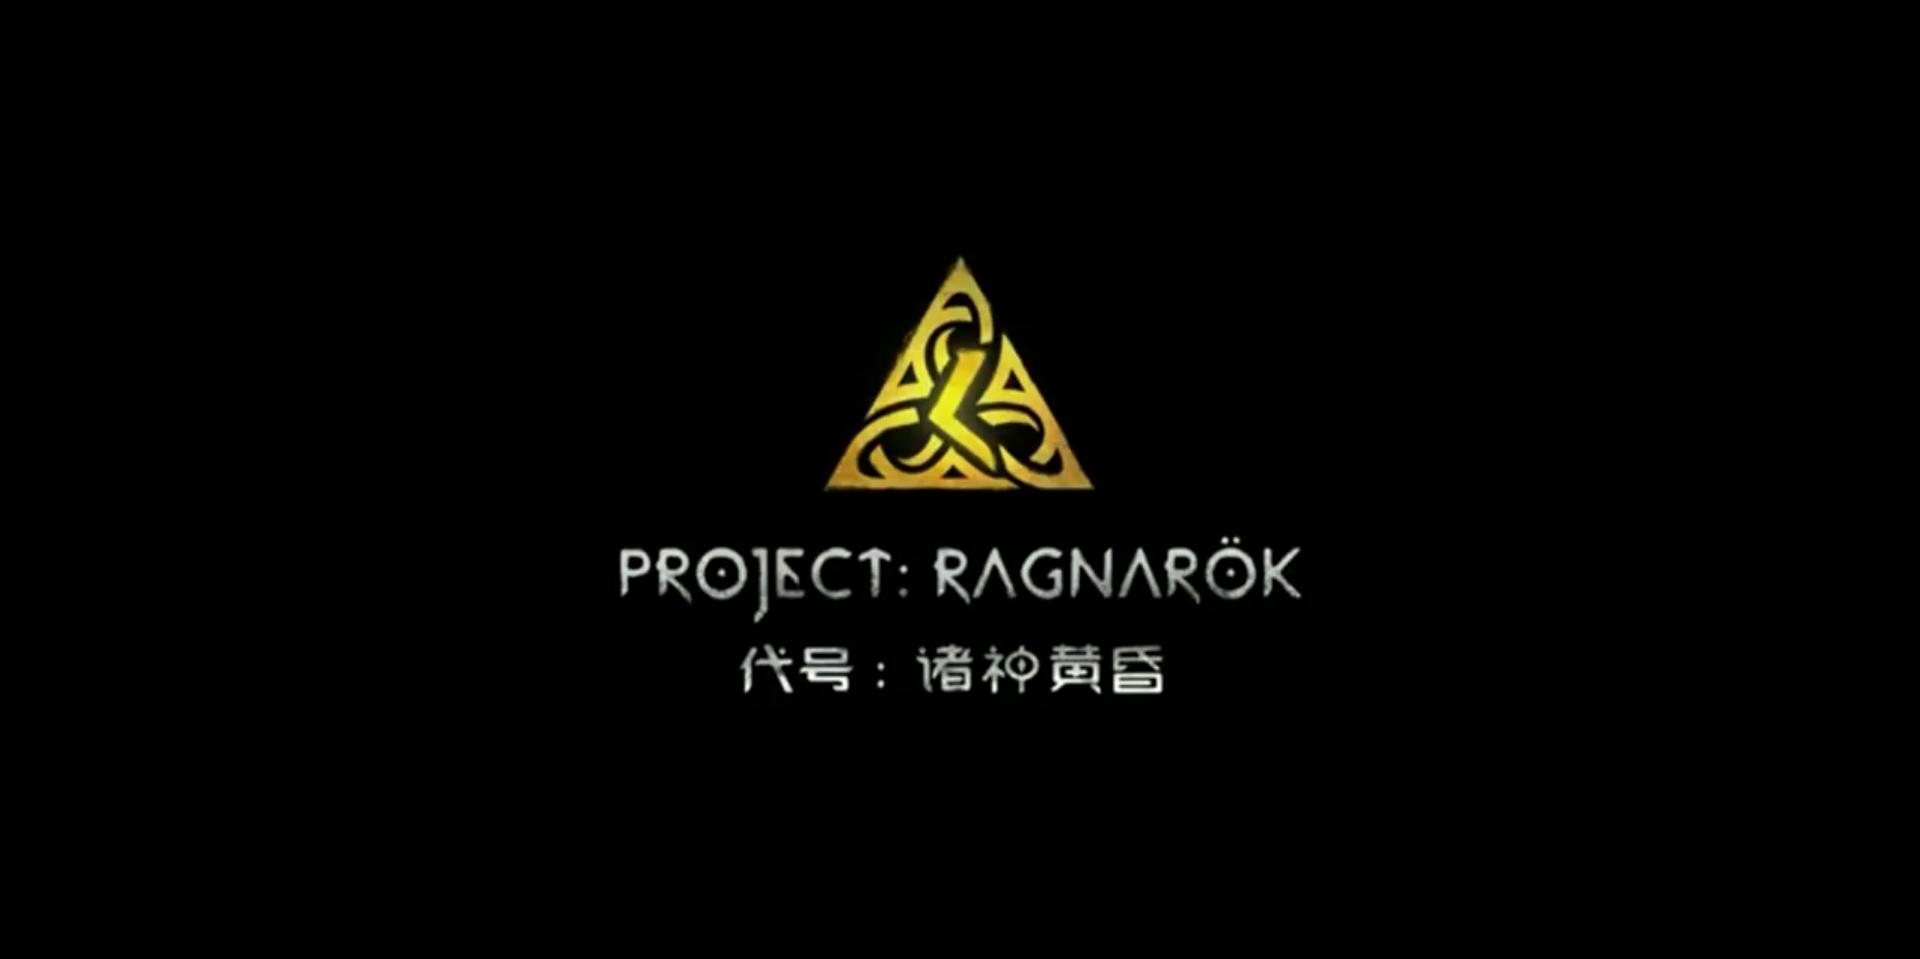 Project Ragnarok Netease New MMORPG Based on Norse Mythology